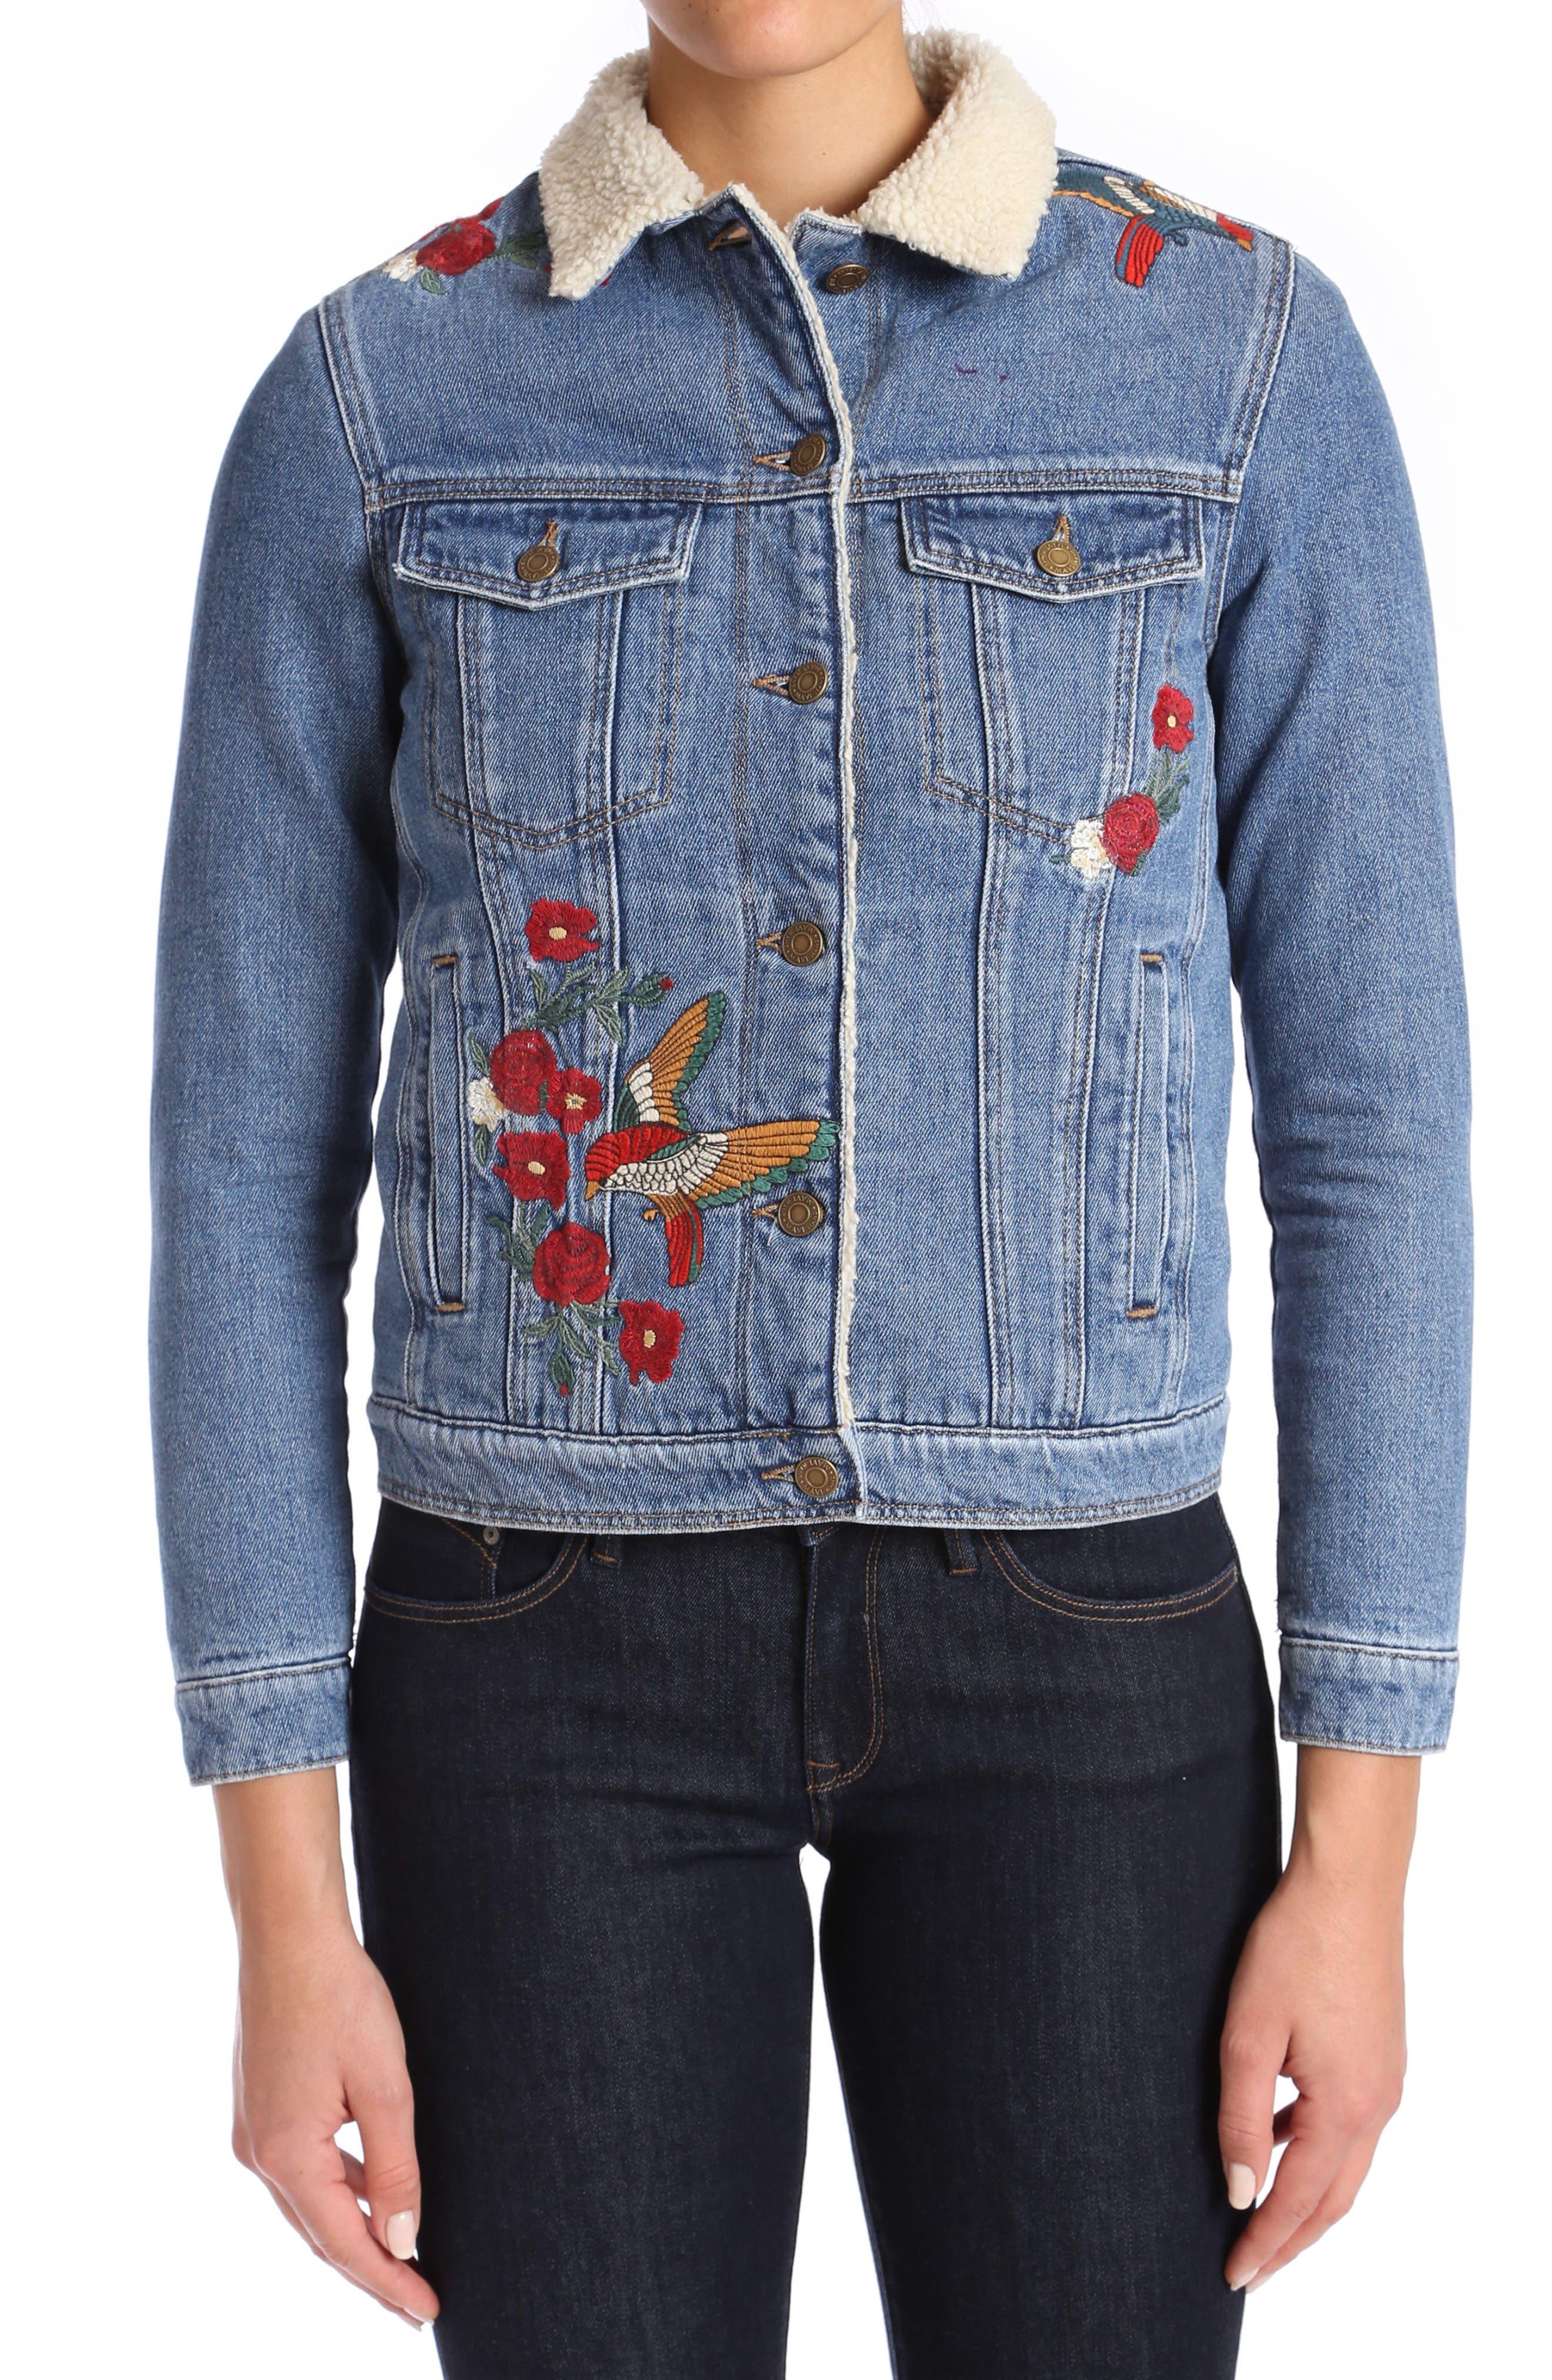 Main Image - Mavi Jeans Katy Embroidered Denim Jacket